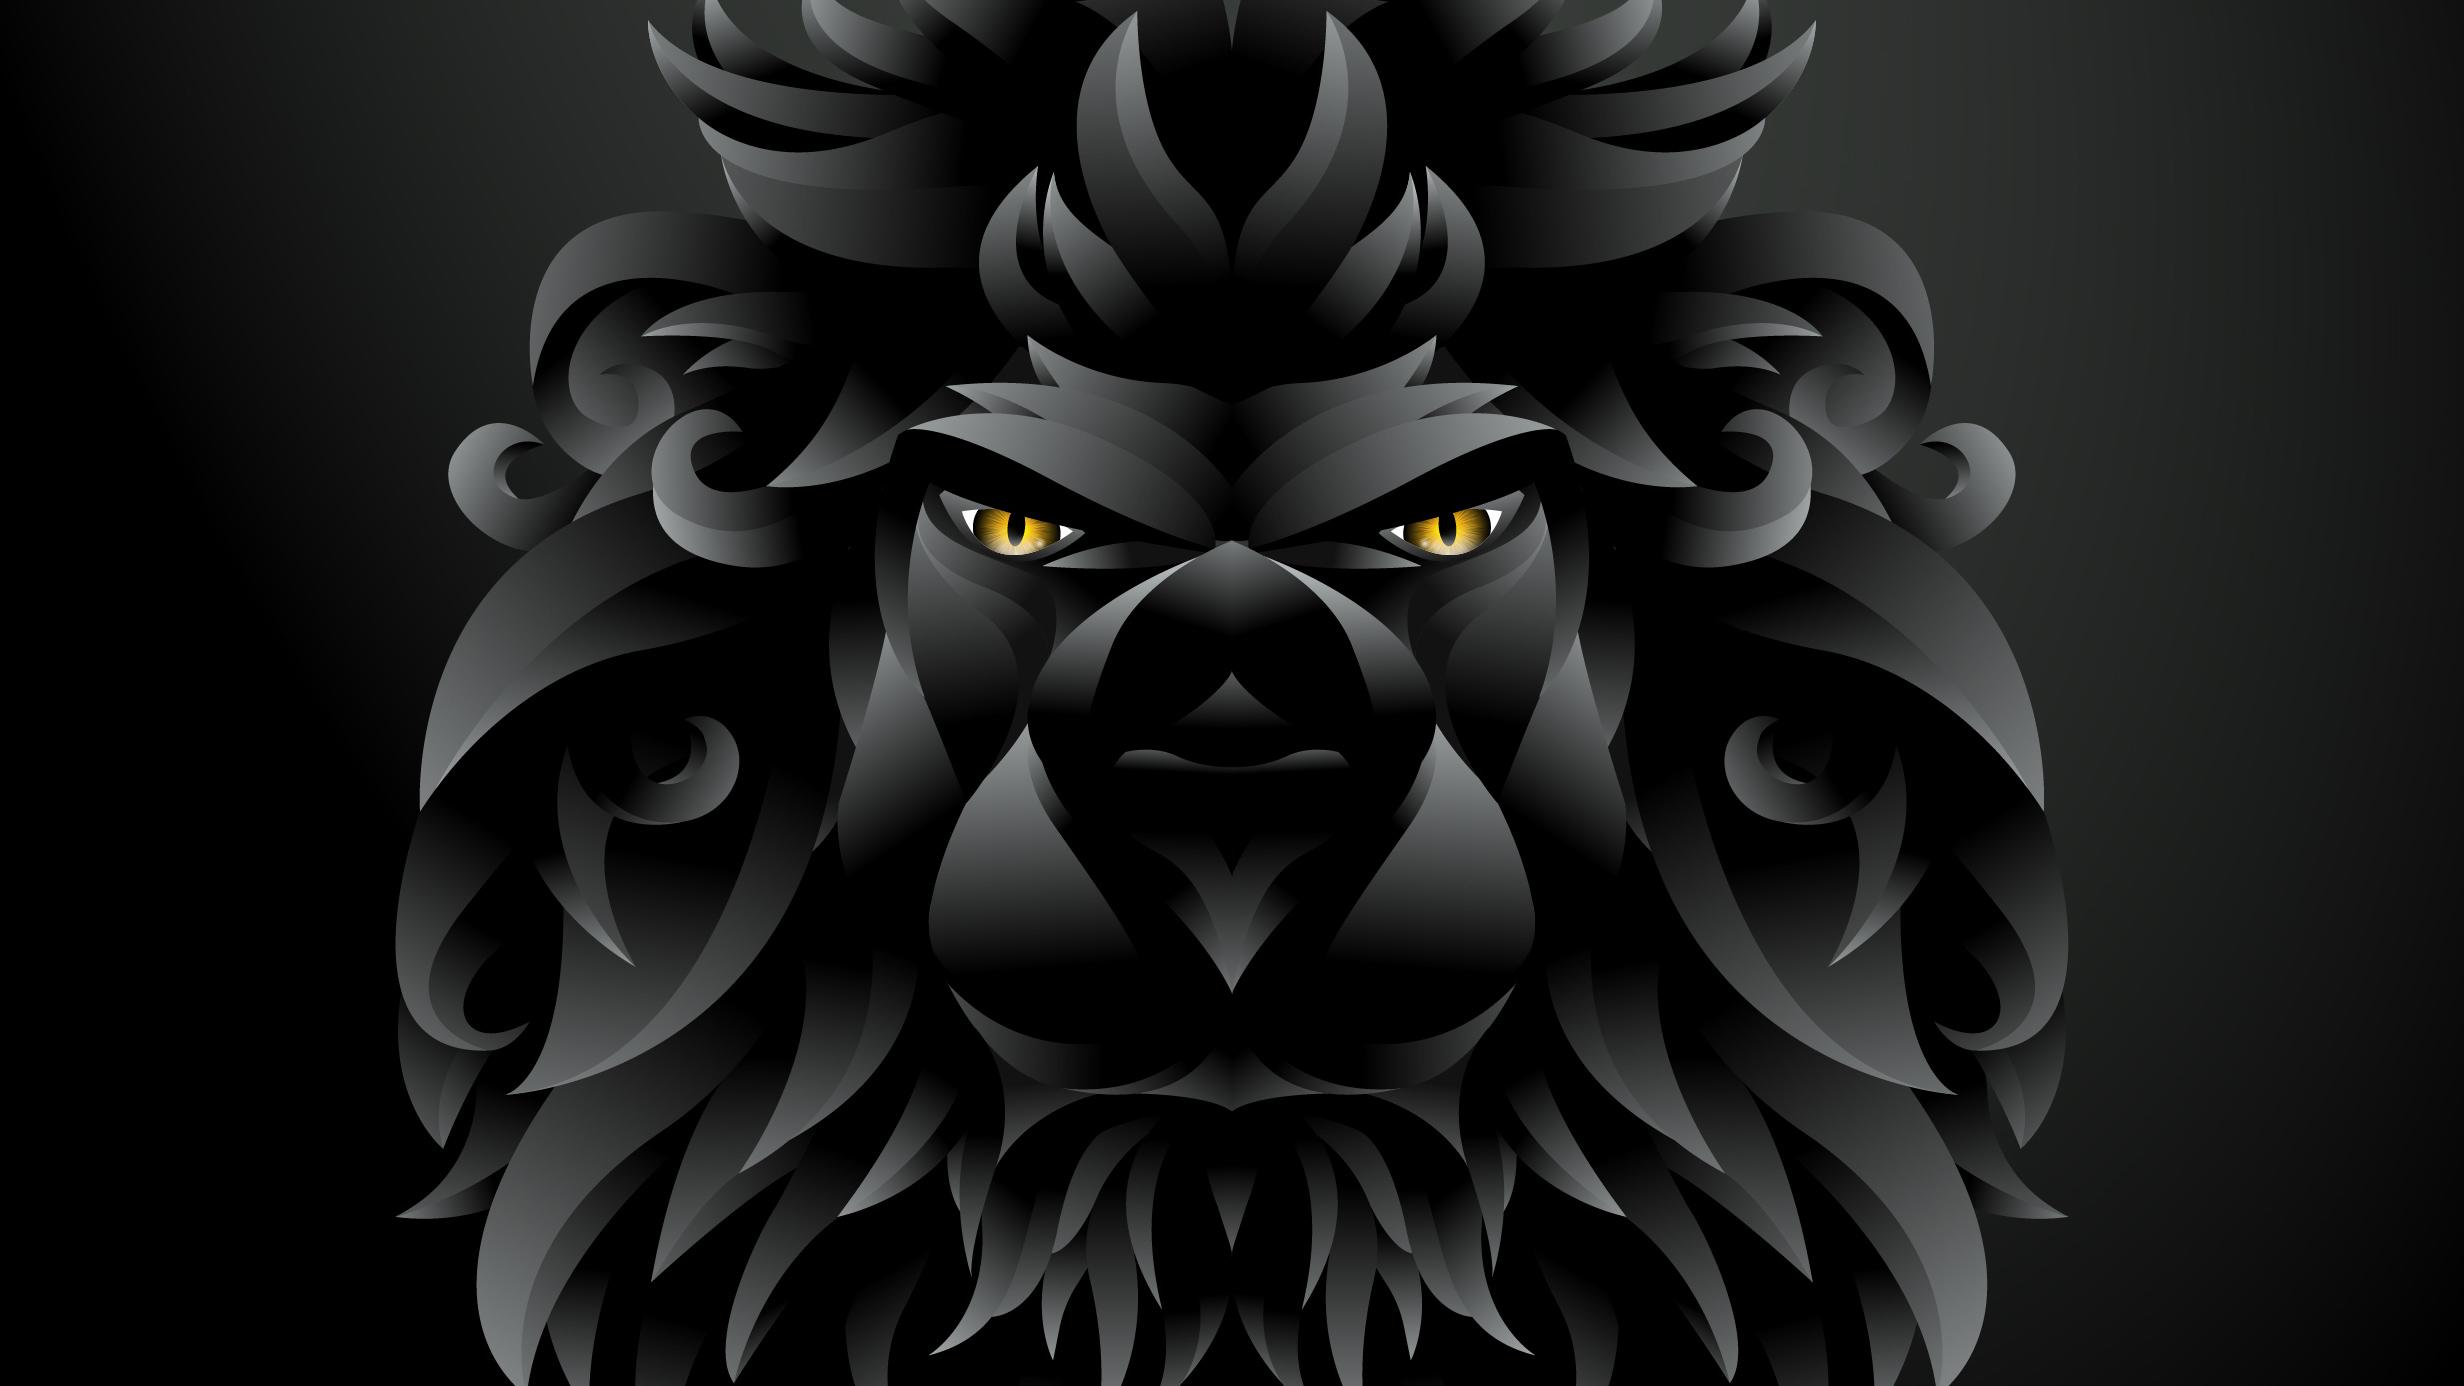 1600x1200 Dark Black Lion Illustration 1600x1200 Resolution